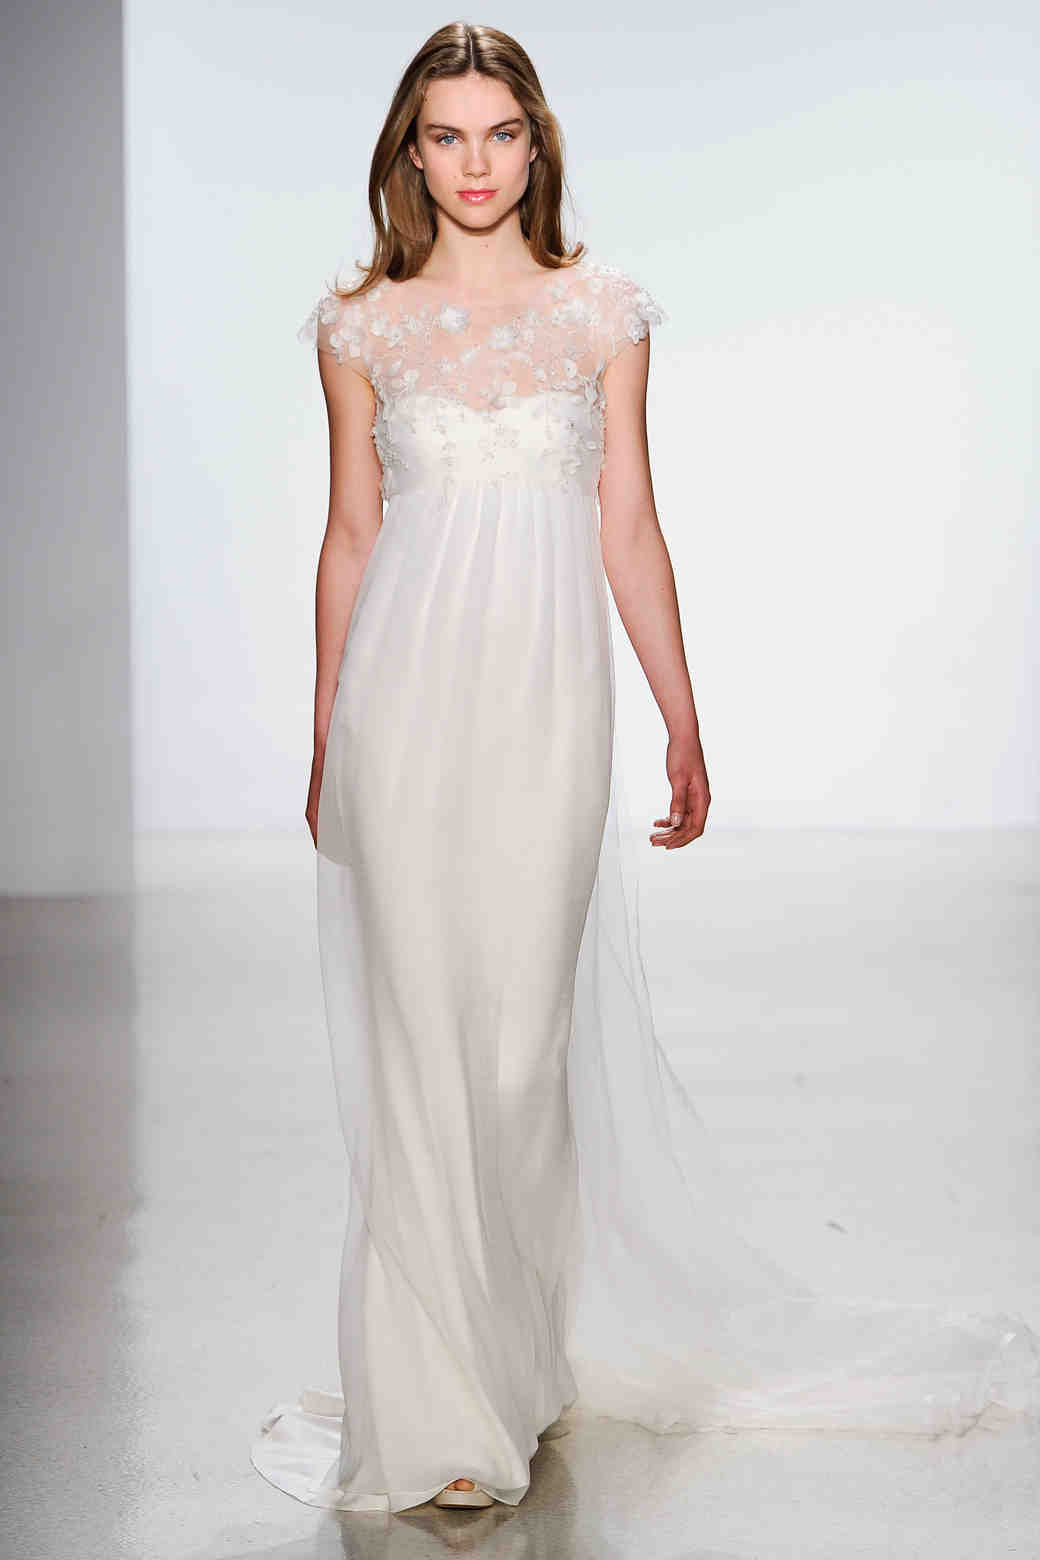 Illusion wedding dresses spring 2014 martha stewart weddings ombrellifo Image collections